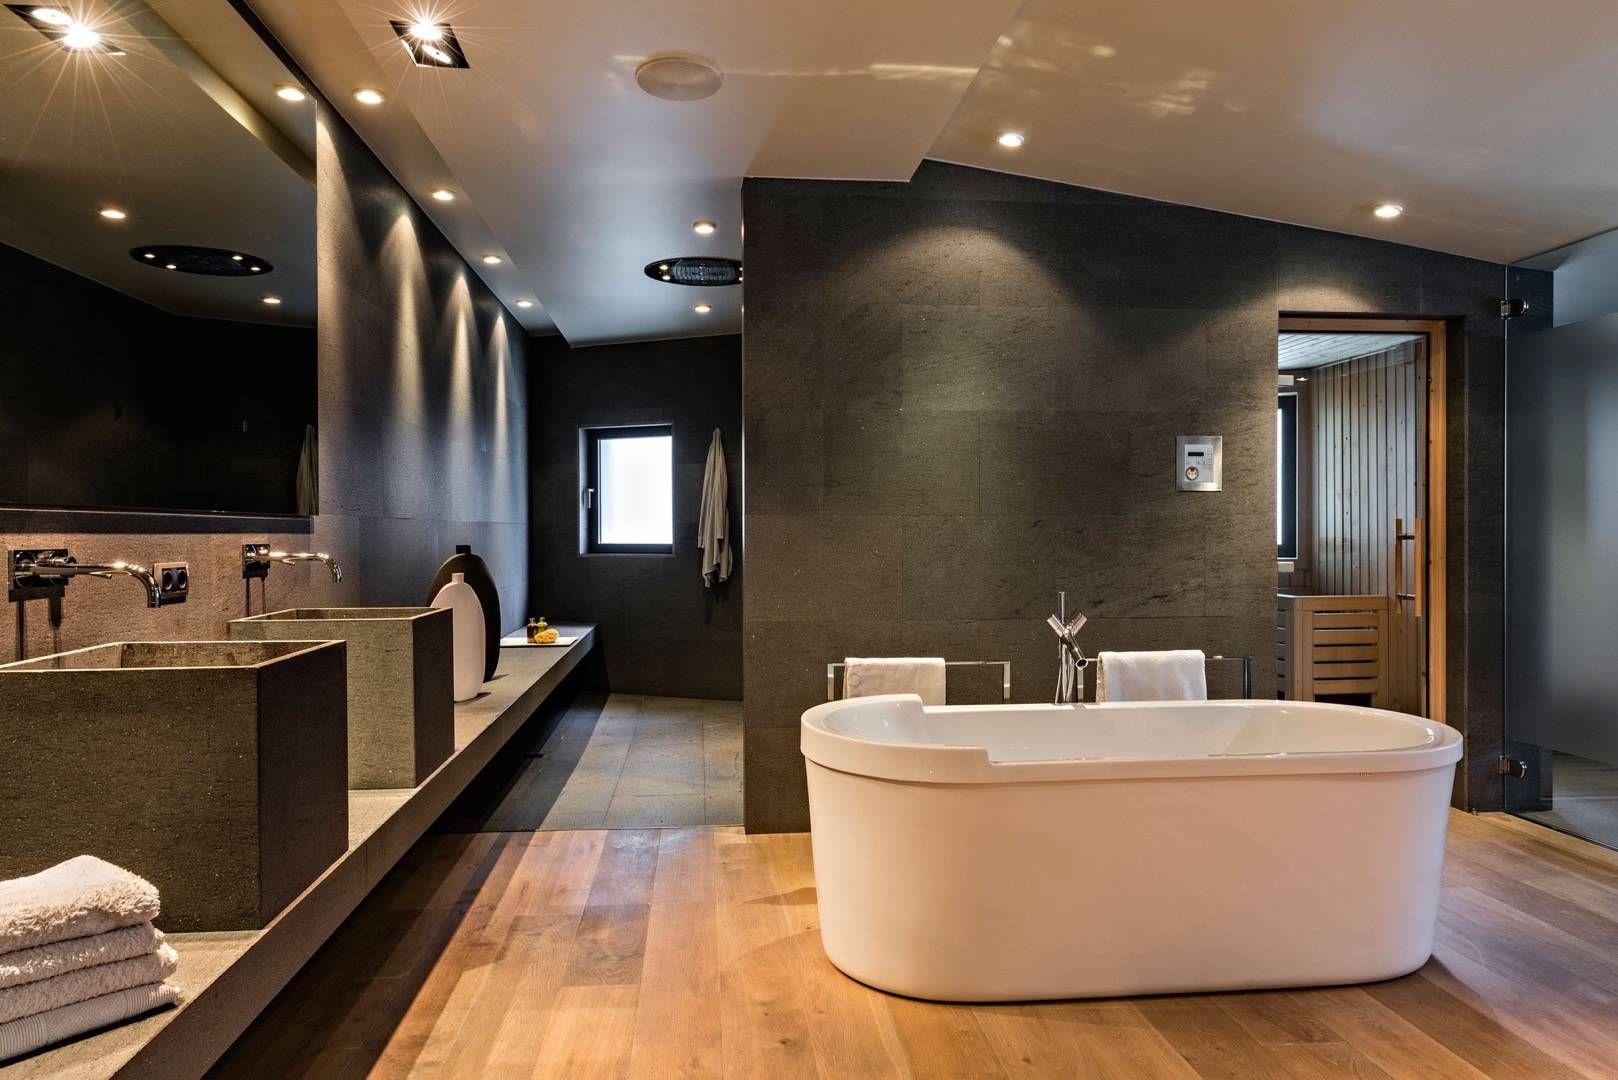 Imagen de Alberto Celestino Poto en Bathrooms